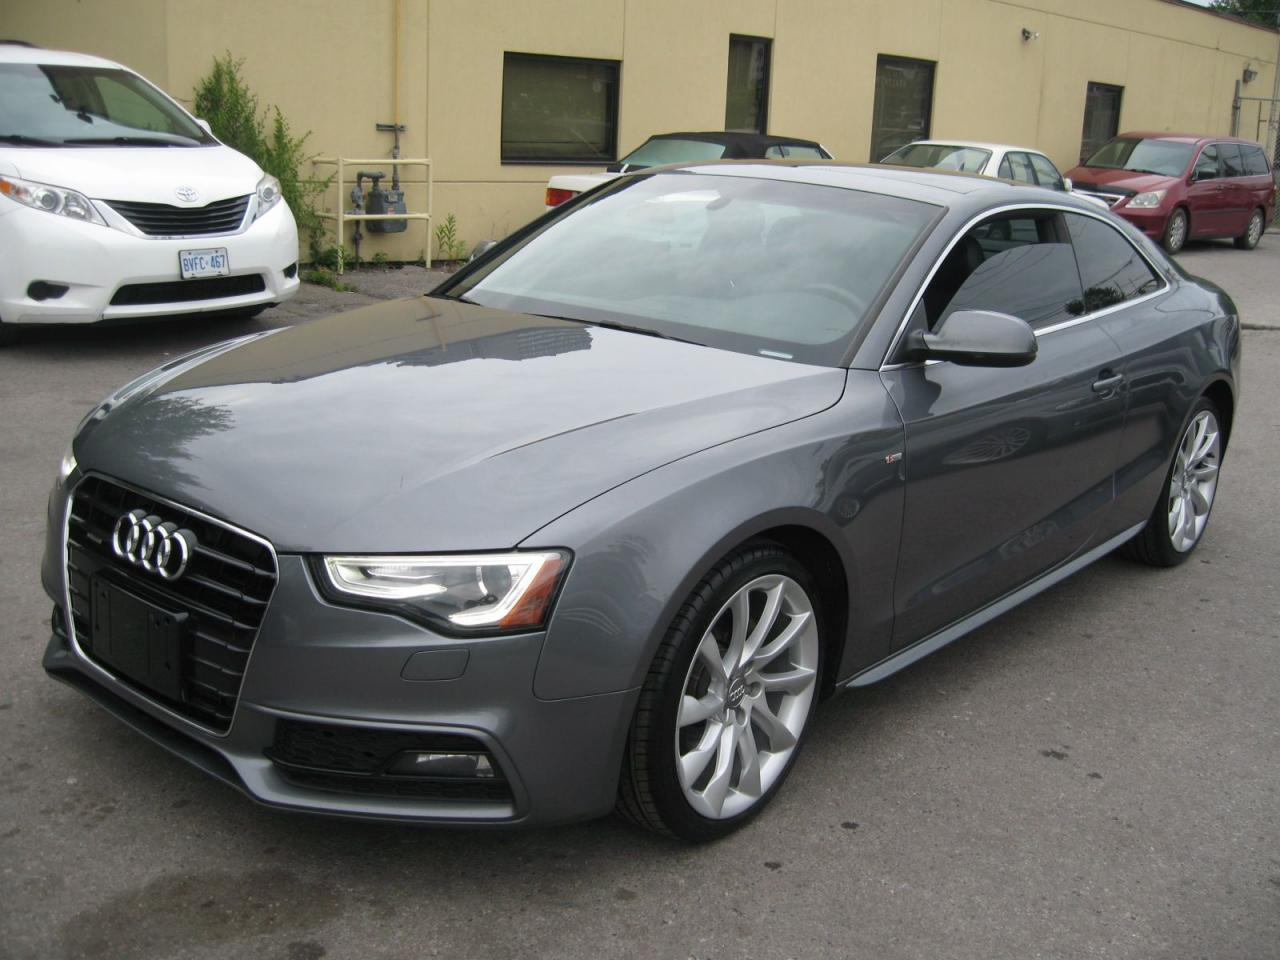 Photo of Gray 2014 Audi A5